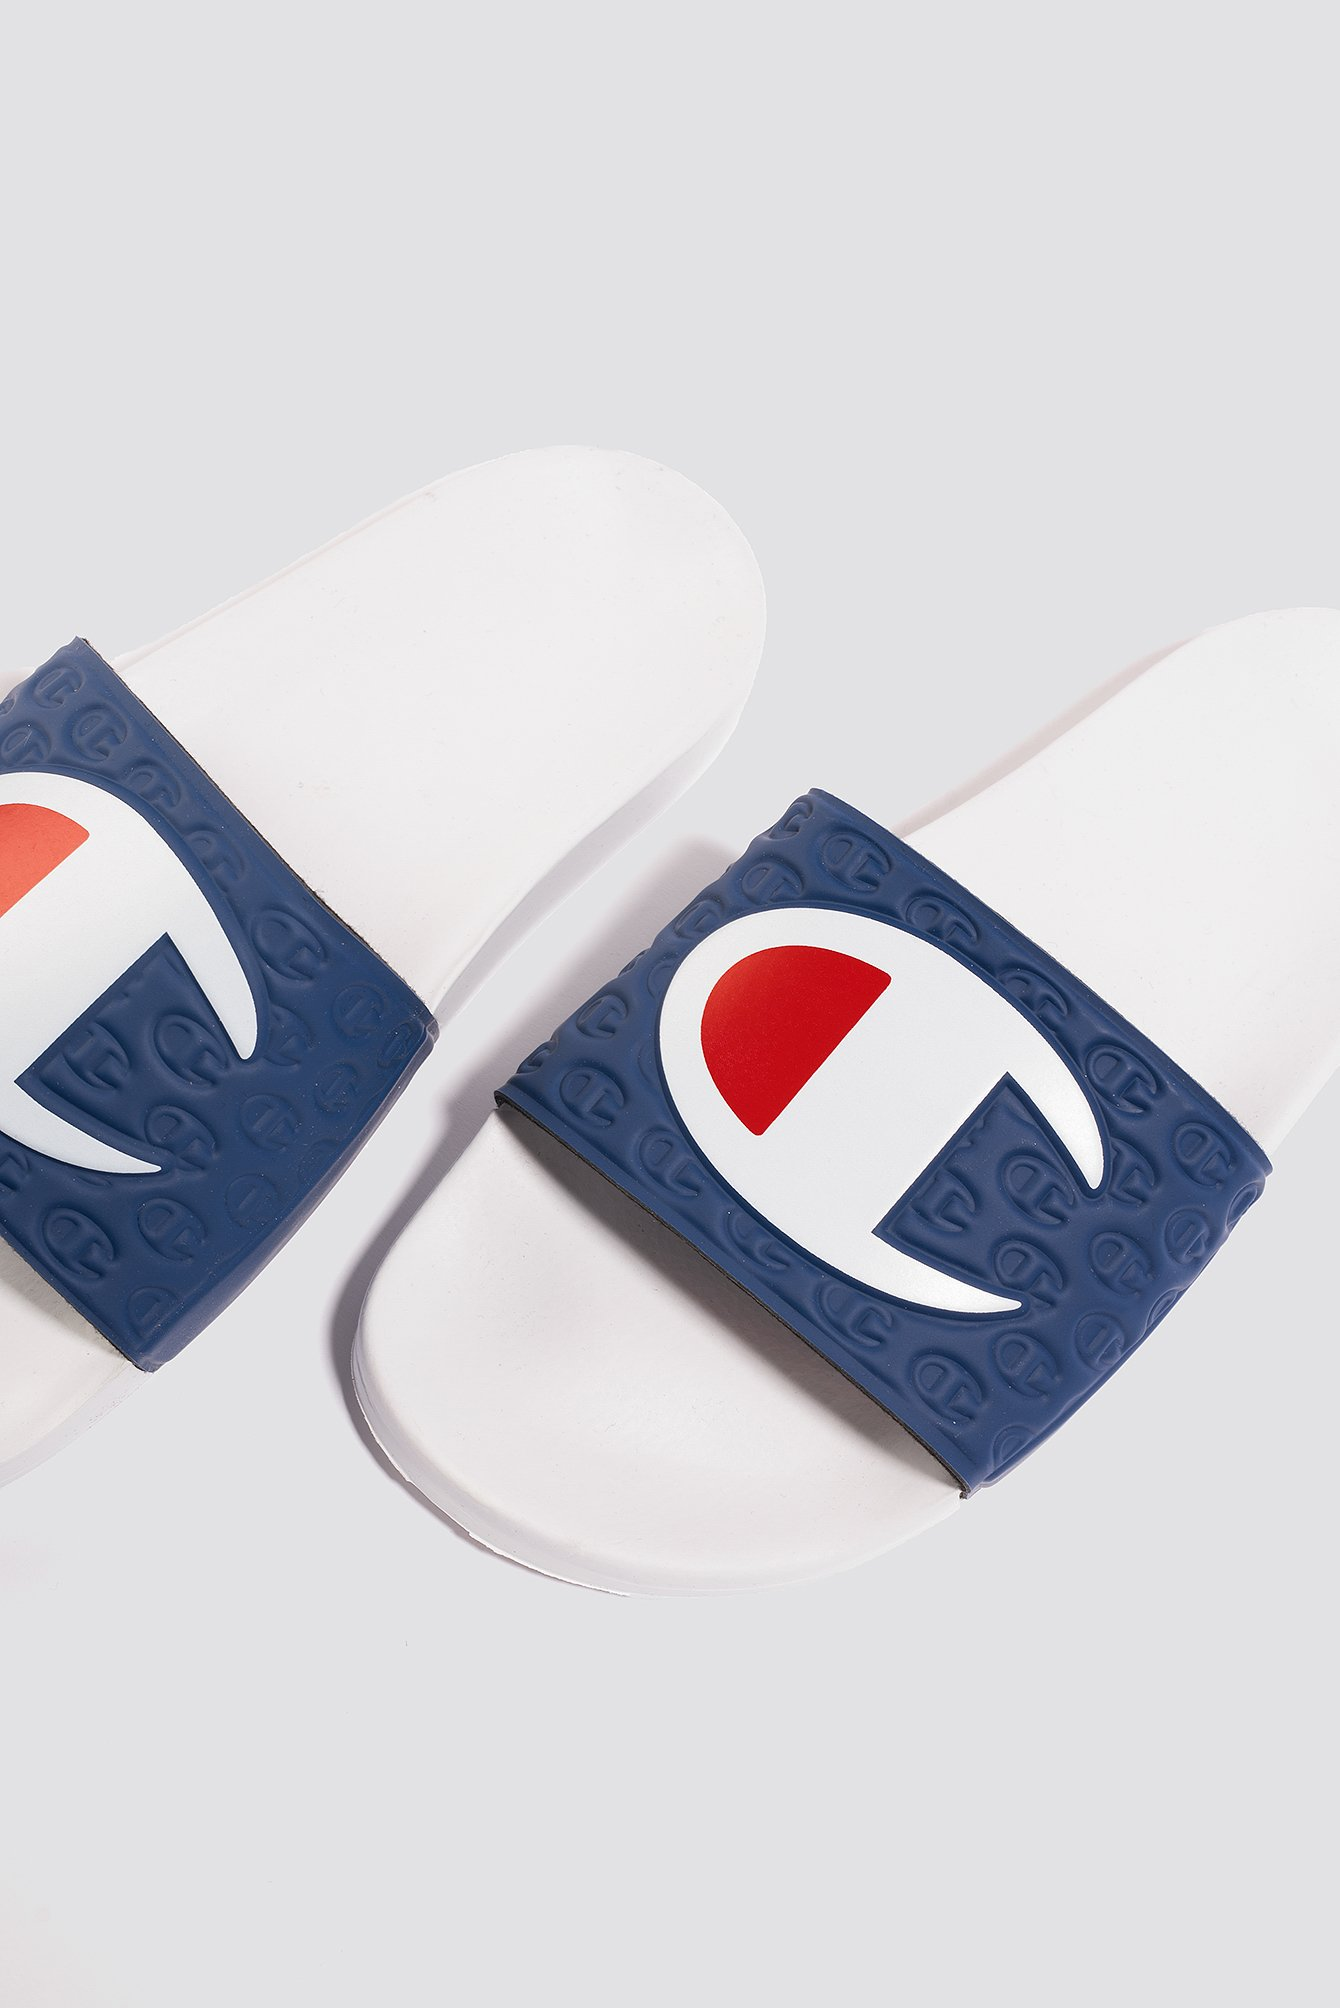 champion -  Multi-Lido Slide - White,Blue